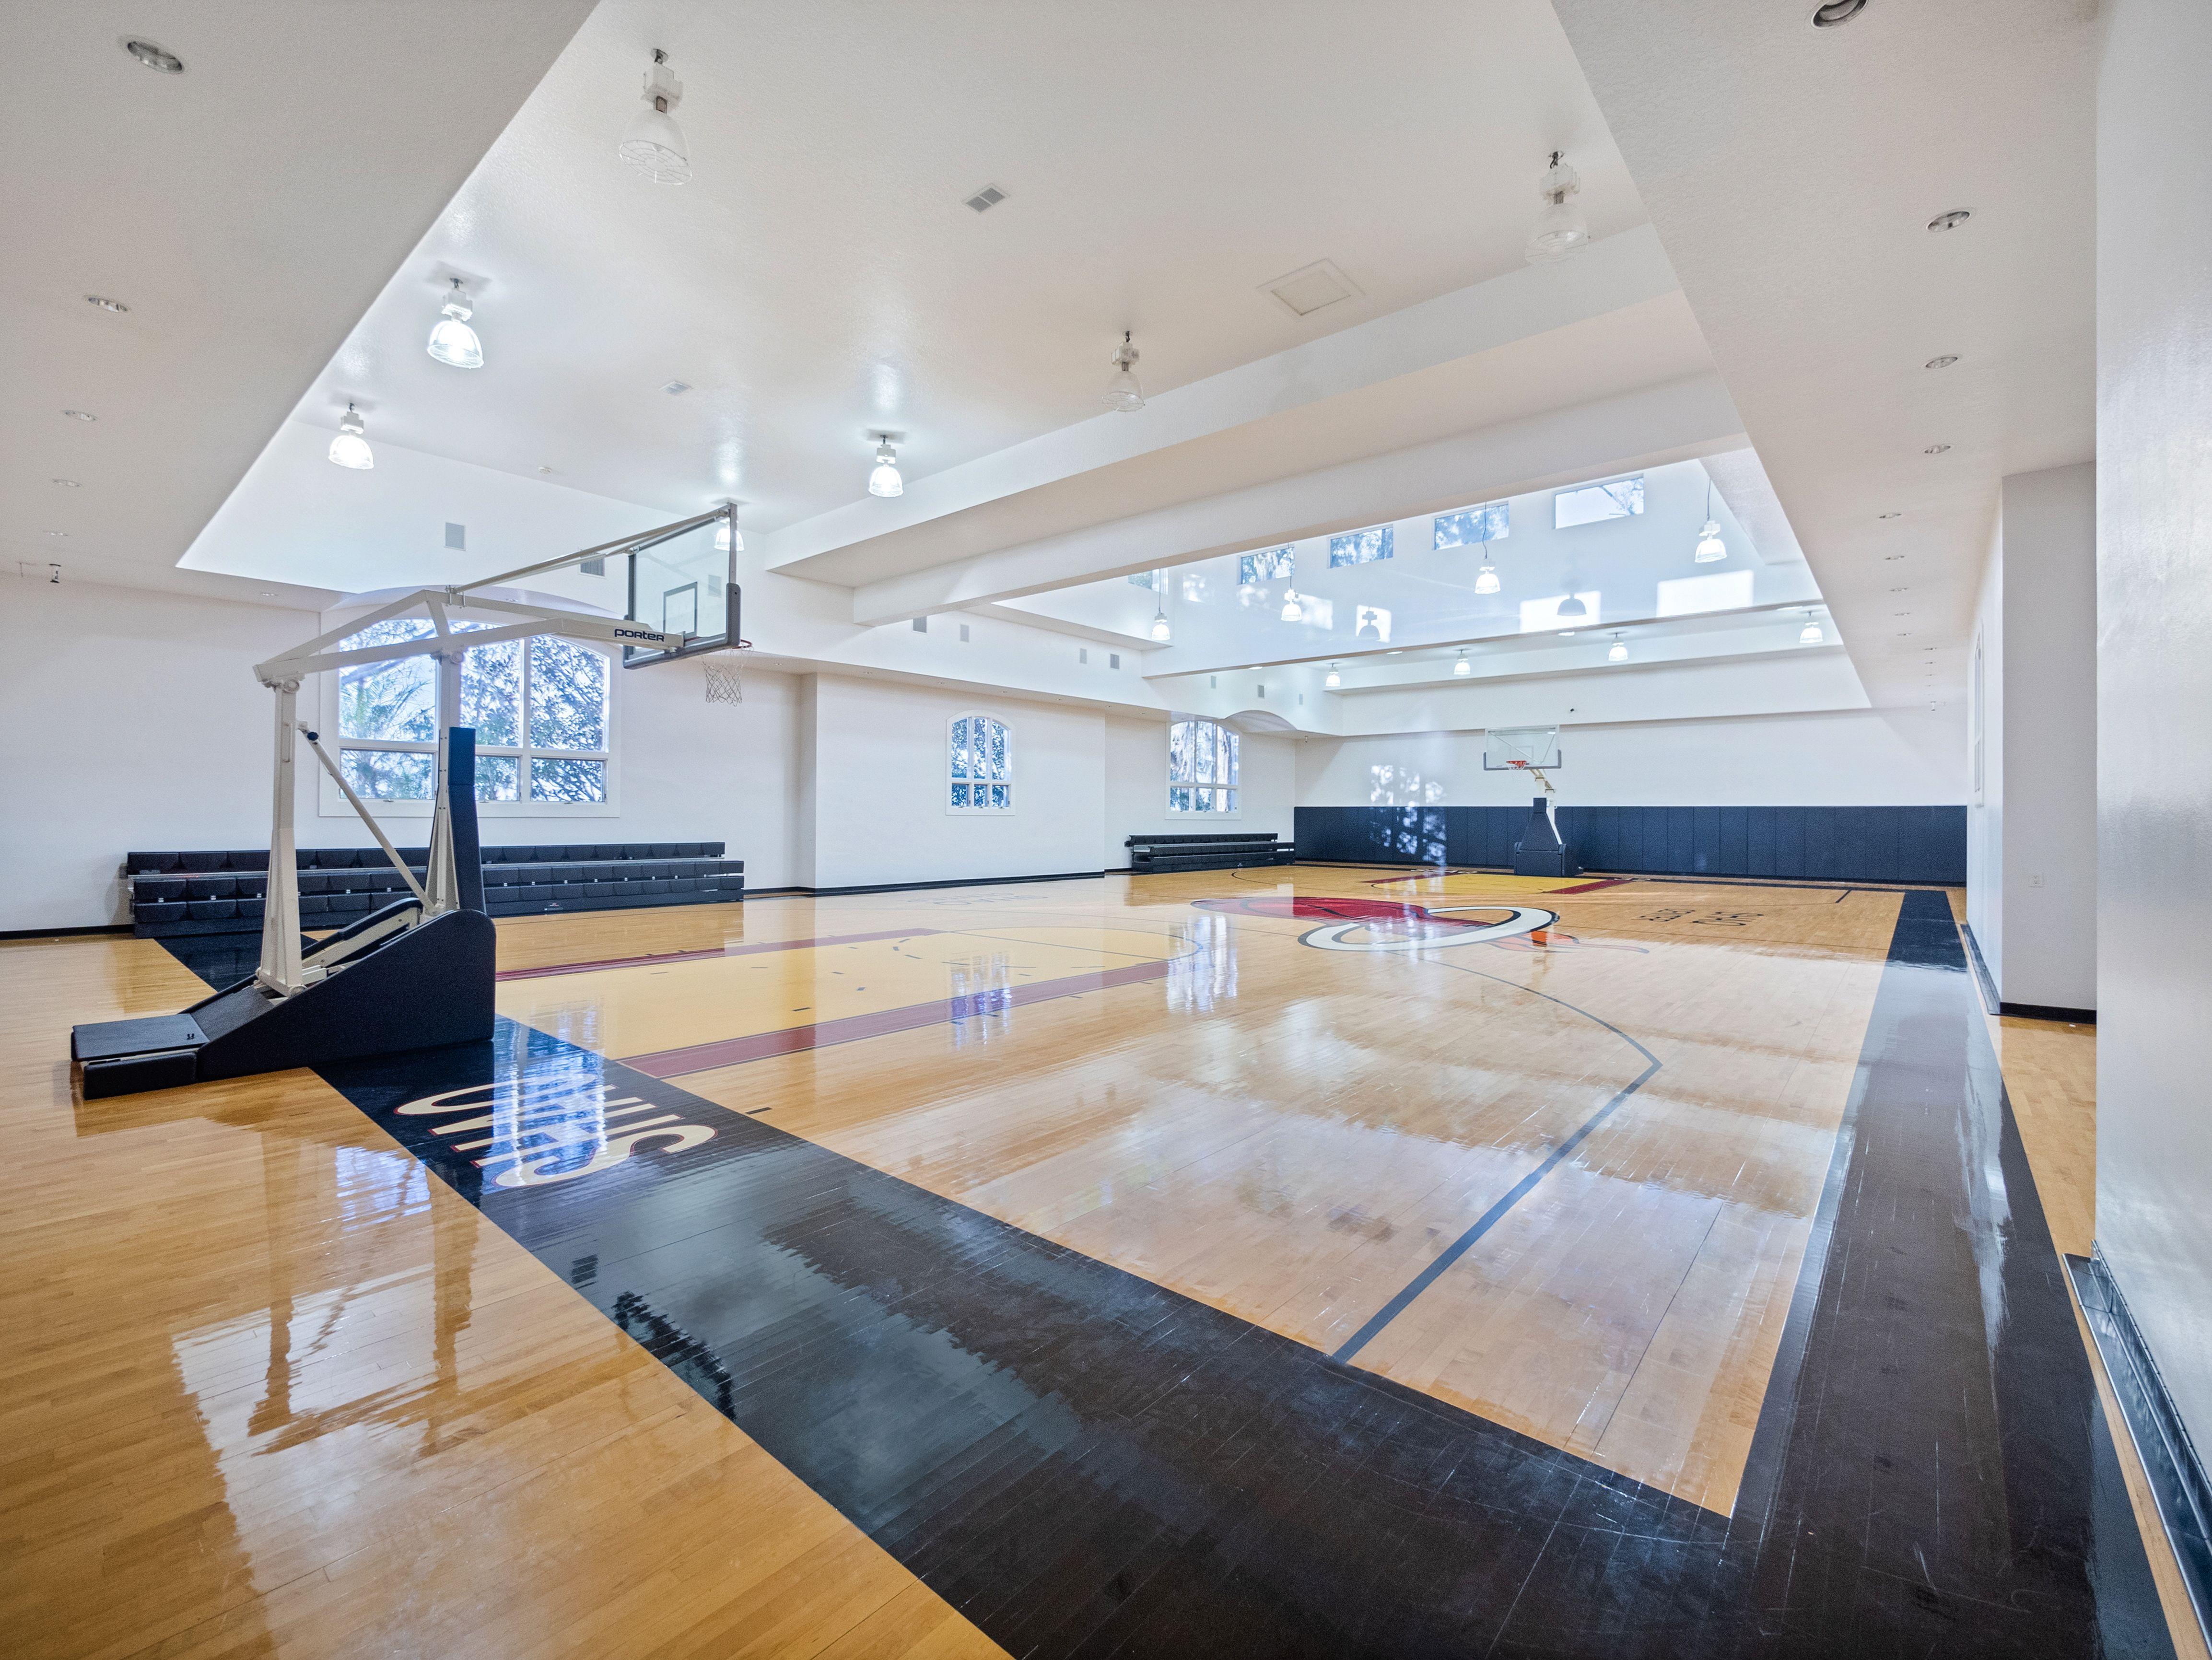 shaq's florida estate indoor basketball court